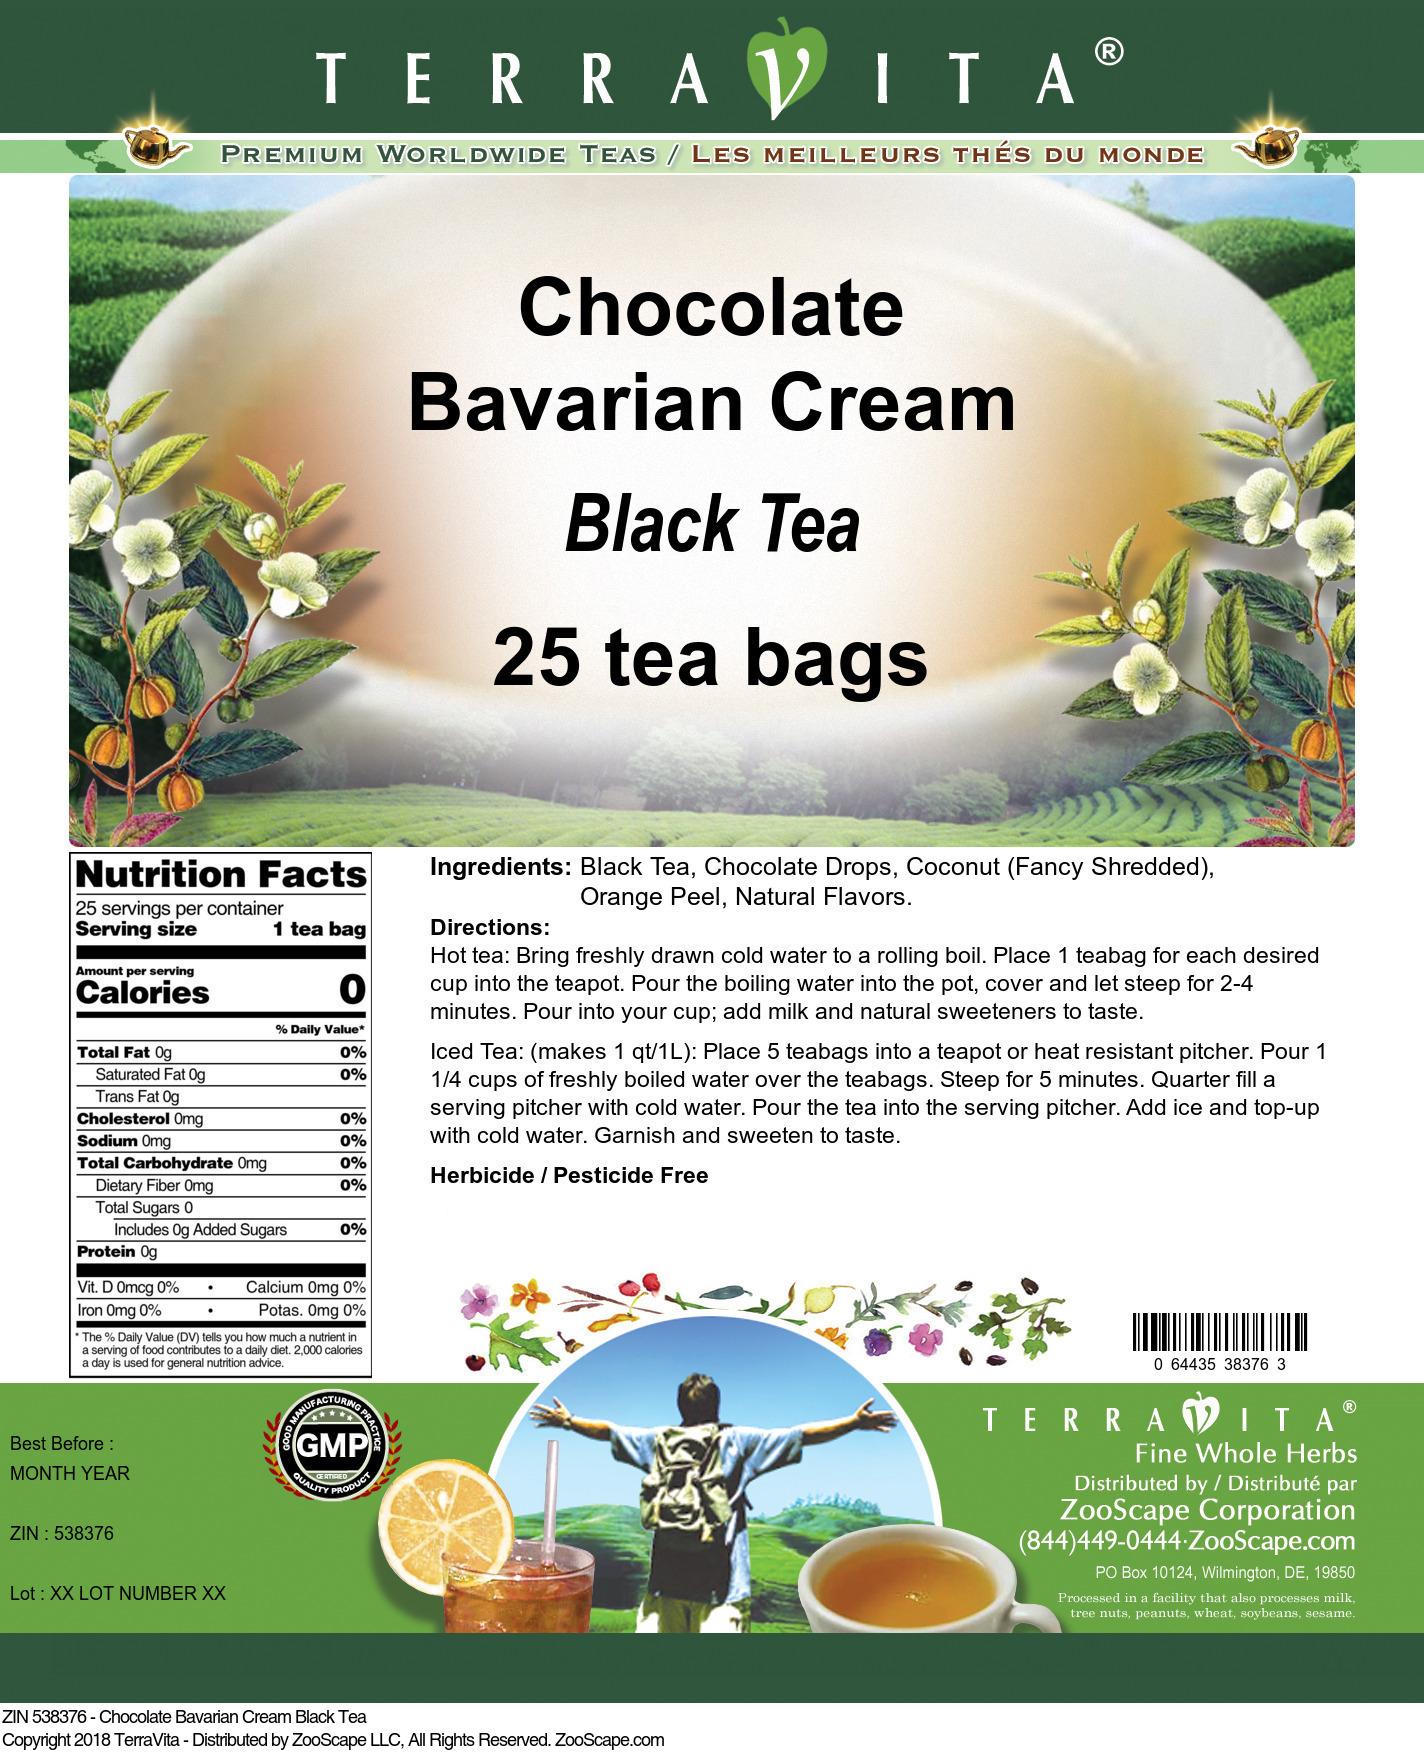 Chocolate Bavarian Cream Black Tea